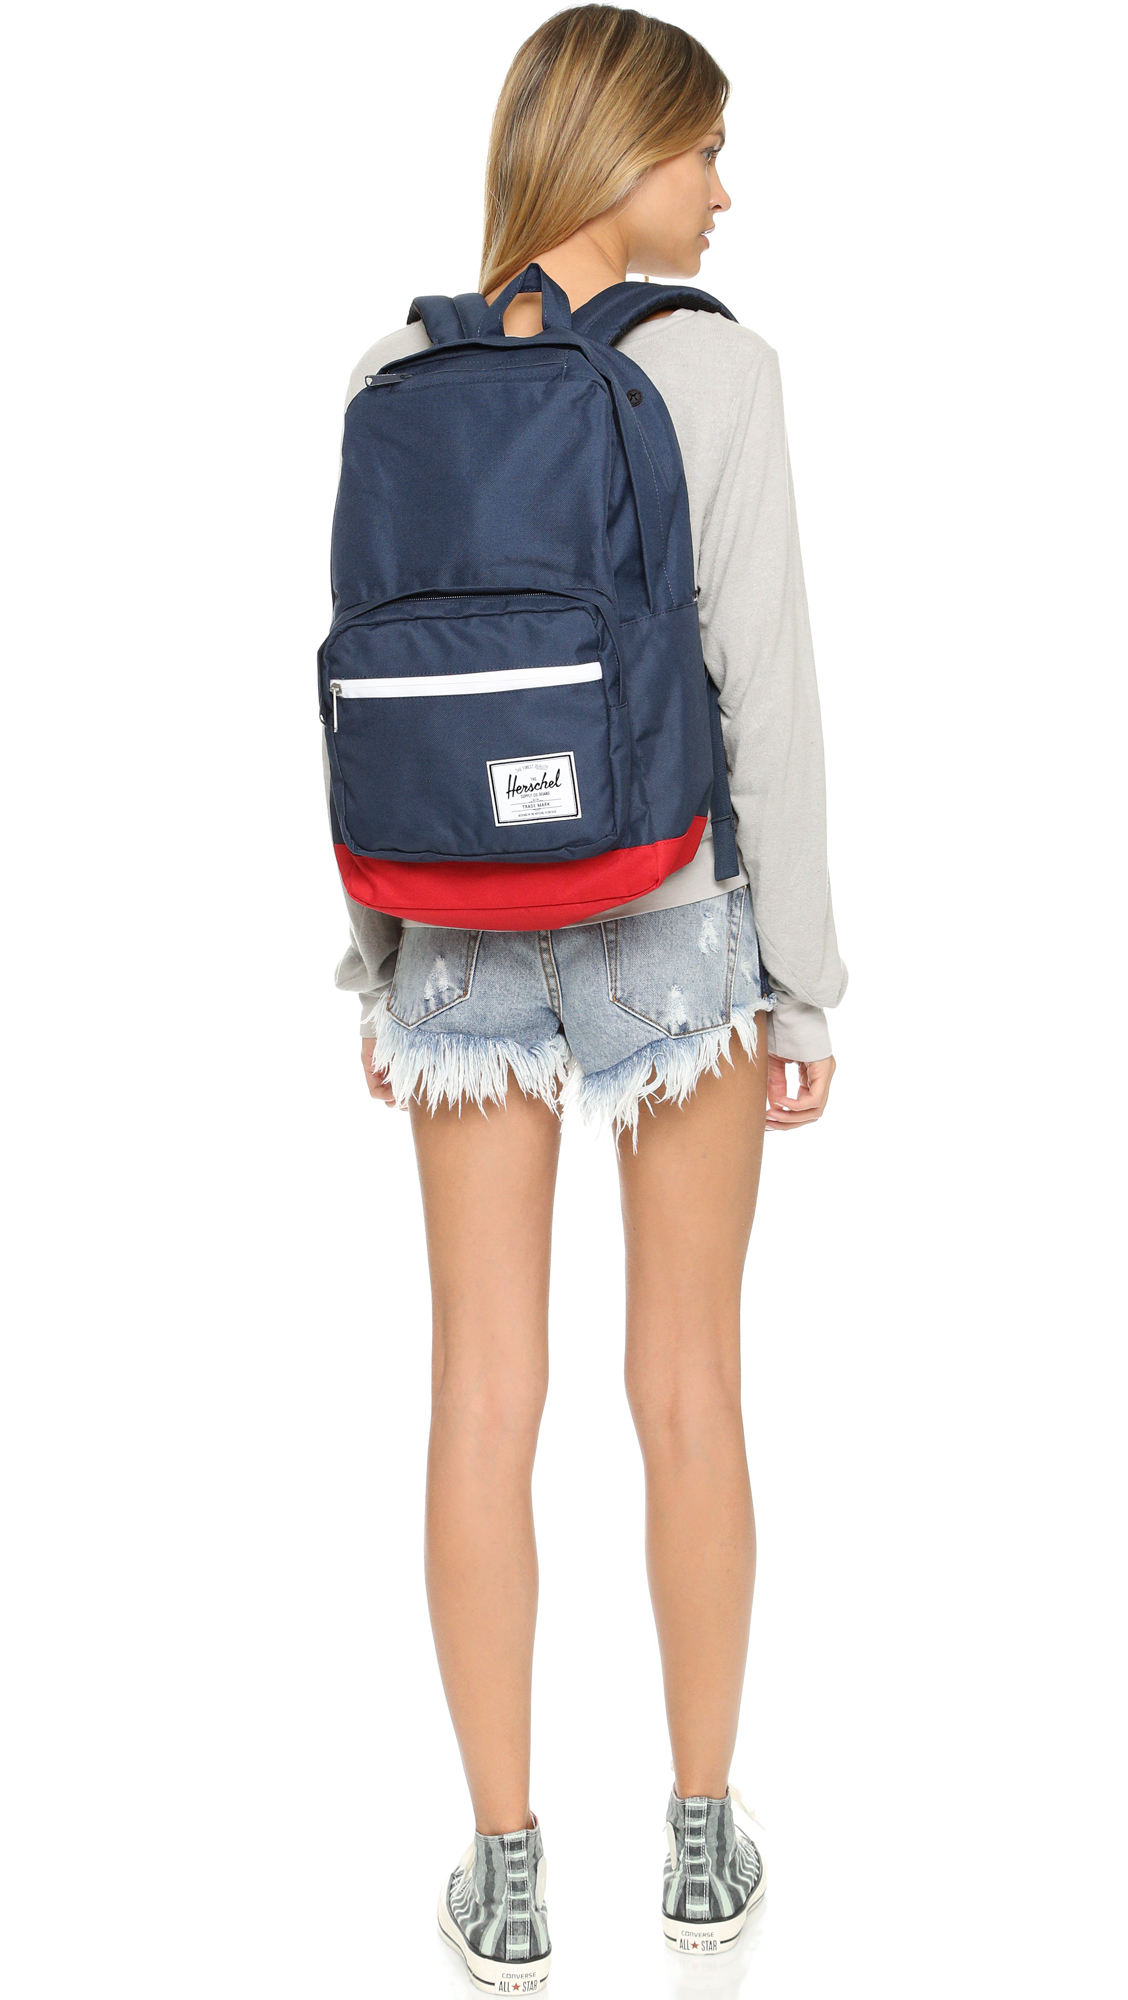 631688afb4e2 Herschel Supply Co. Blue Pop Quiz Backpack - Navy/red